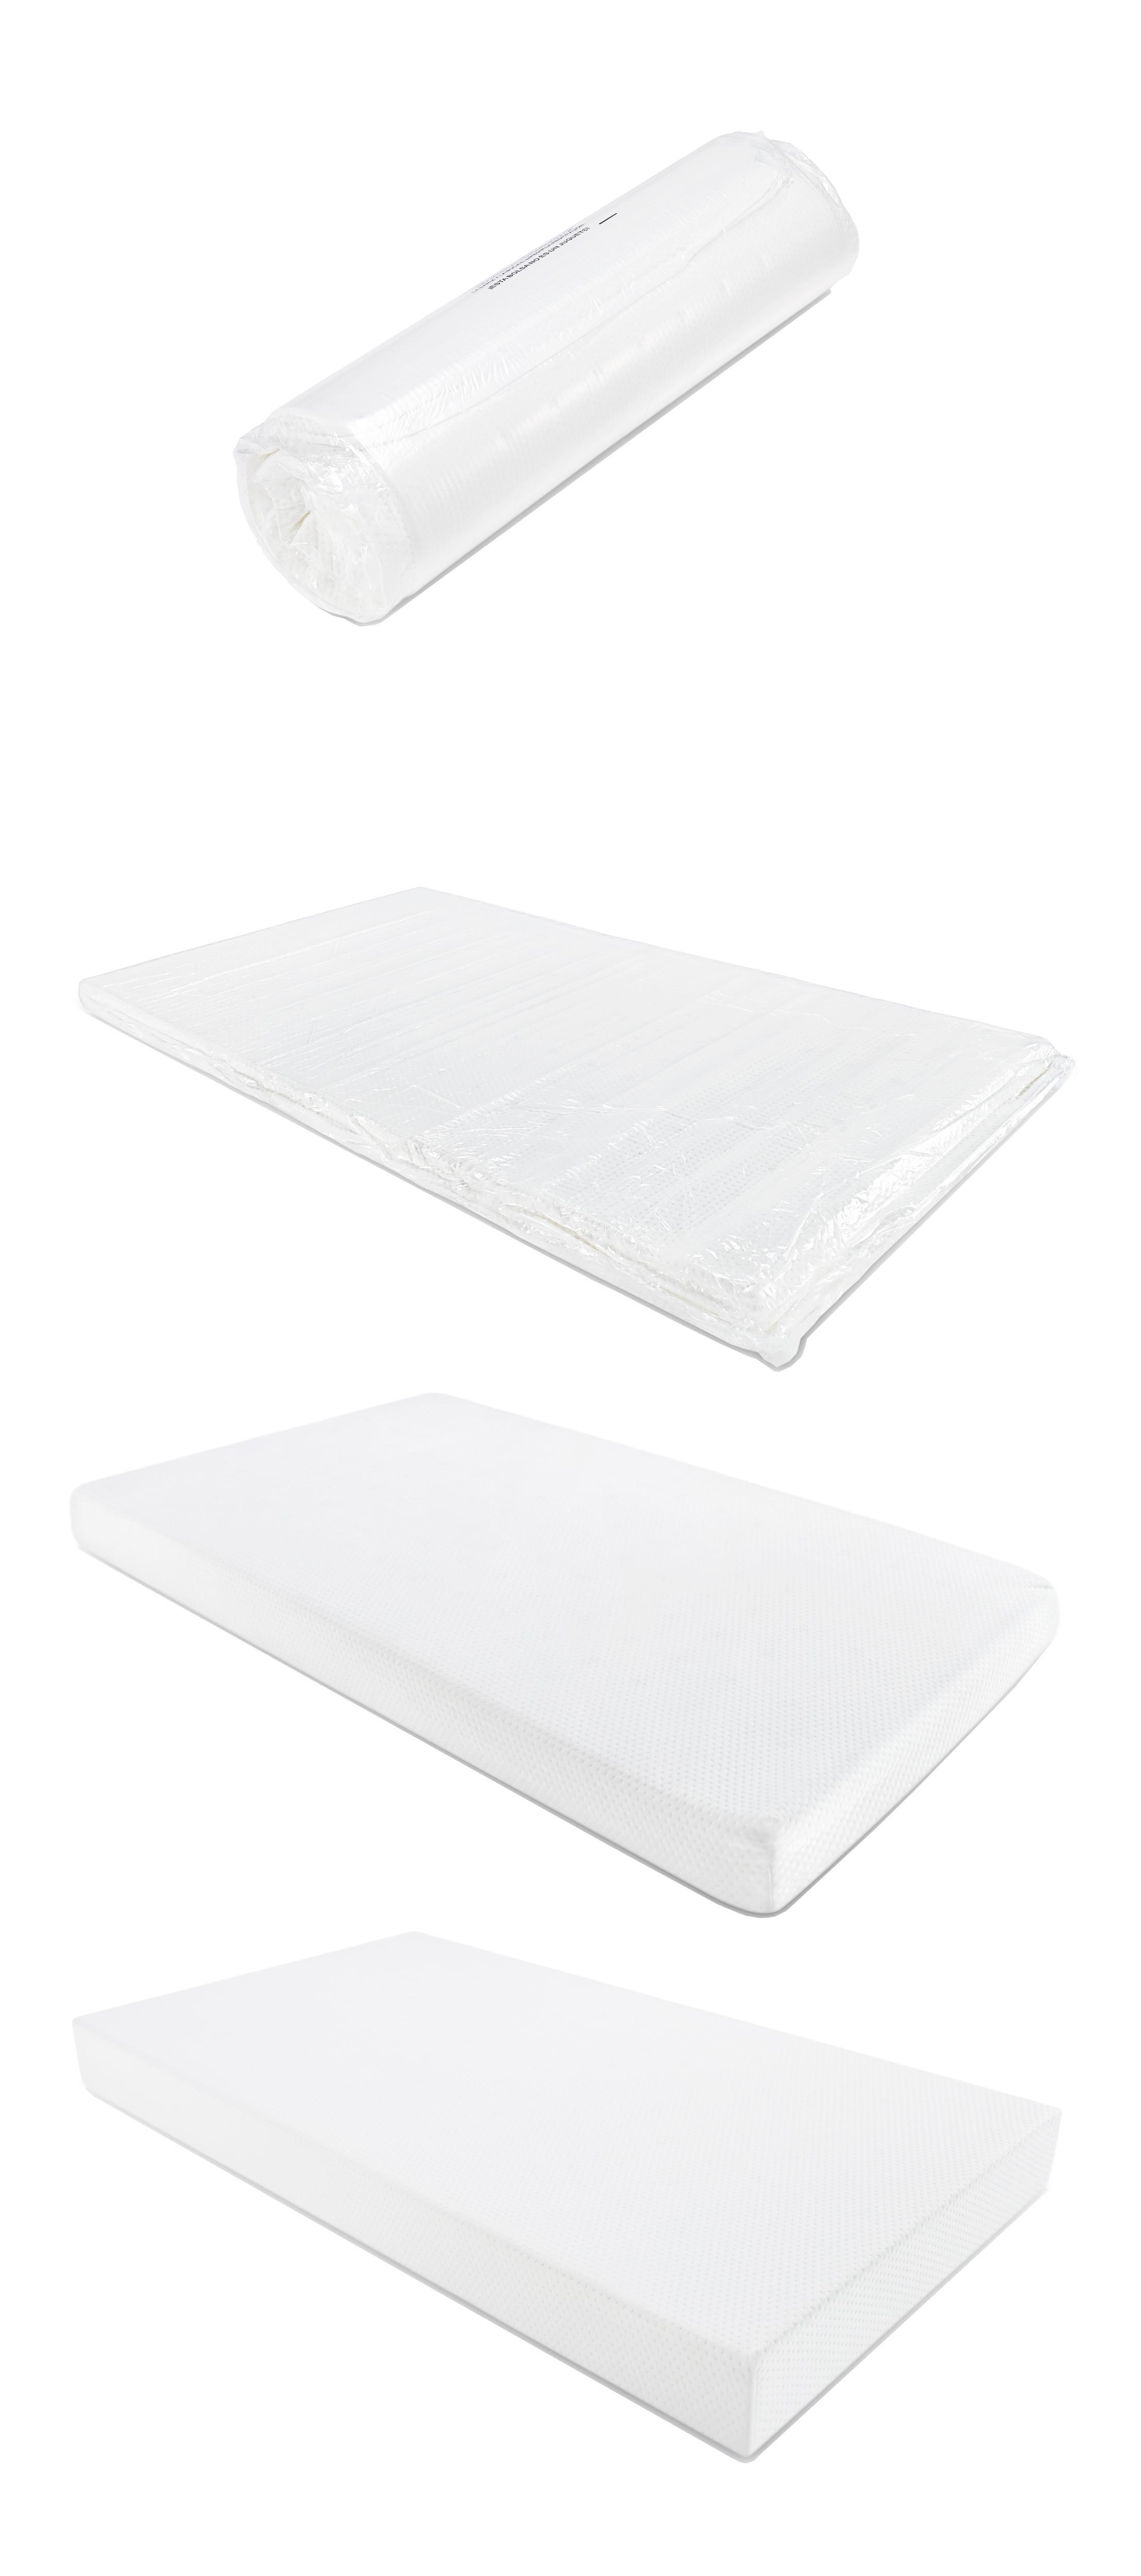 Graco Premium Foam Crib And Toddler Bed Mattress Amazon